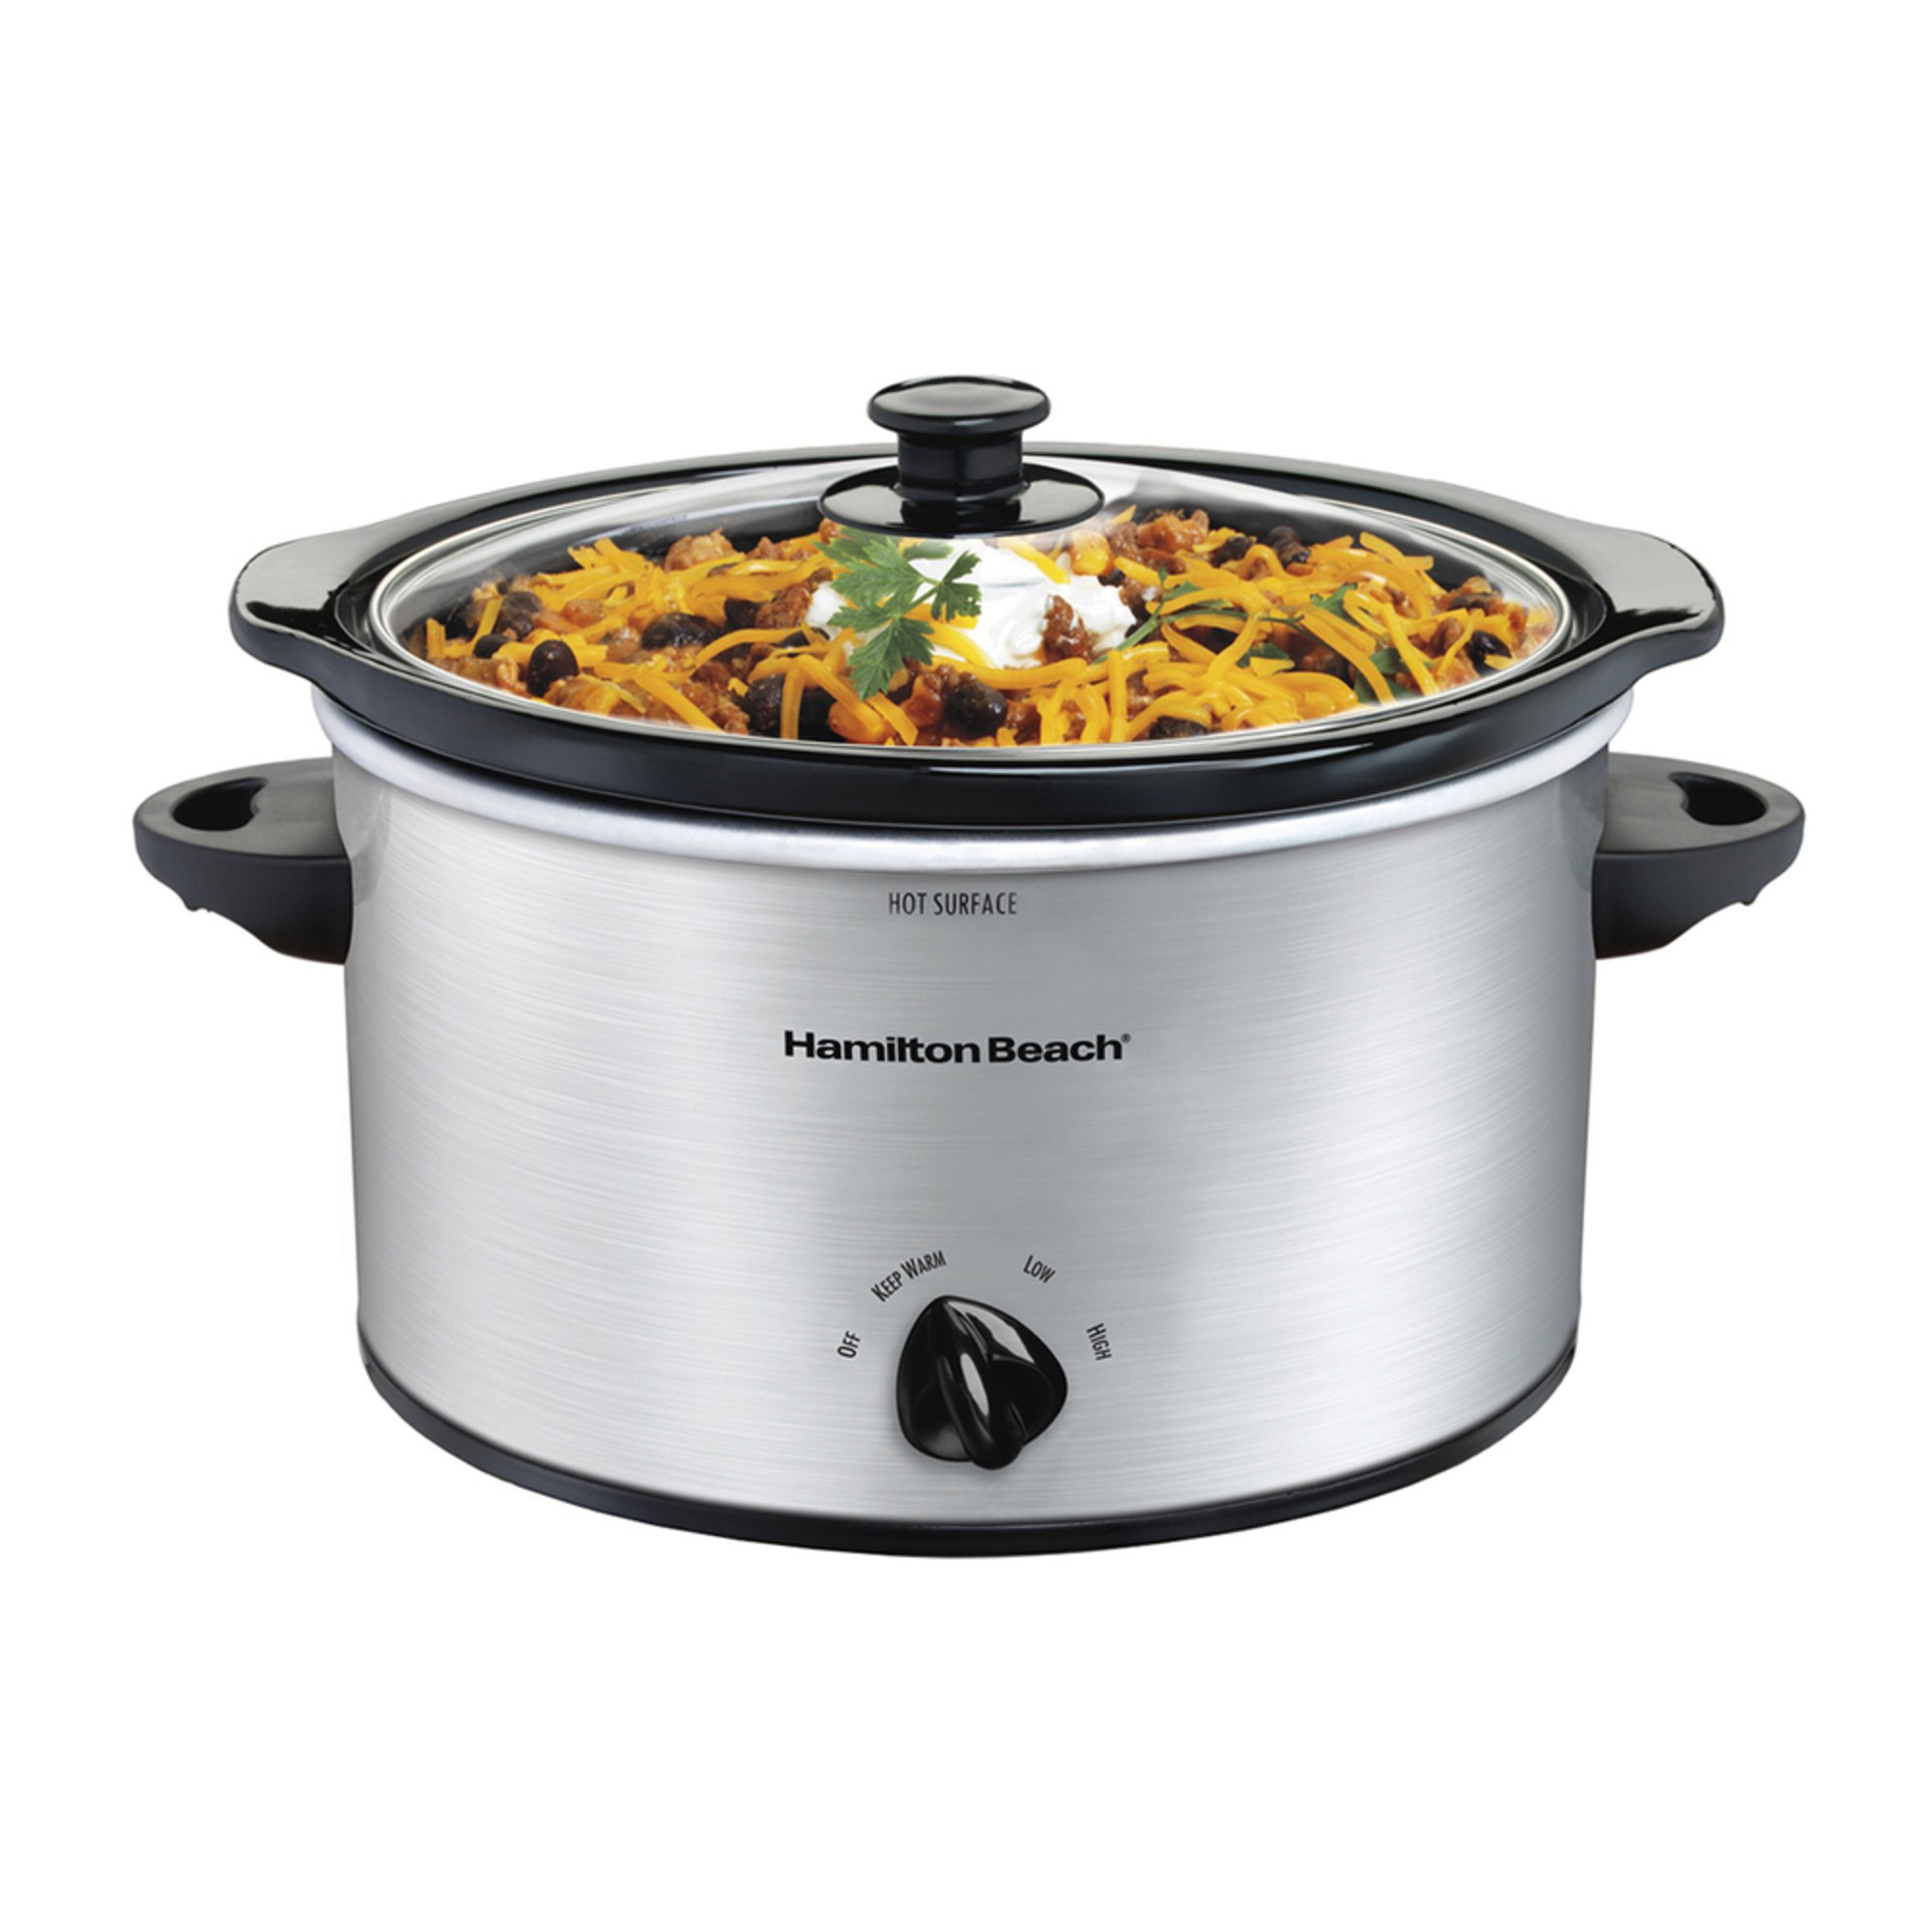 Hamilton beach 3 quart slow cooker 33236 slow cookers for Hamilton beach pioneer woman slow cooker